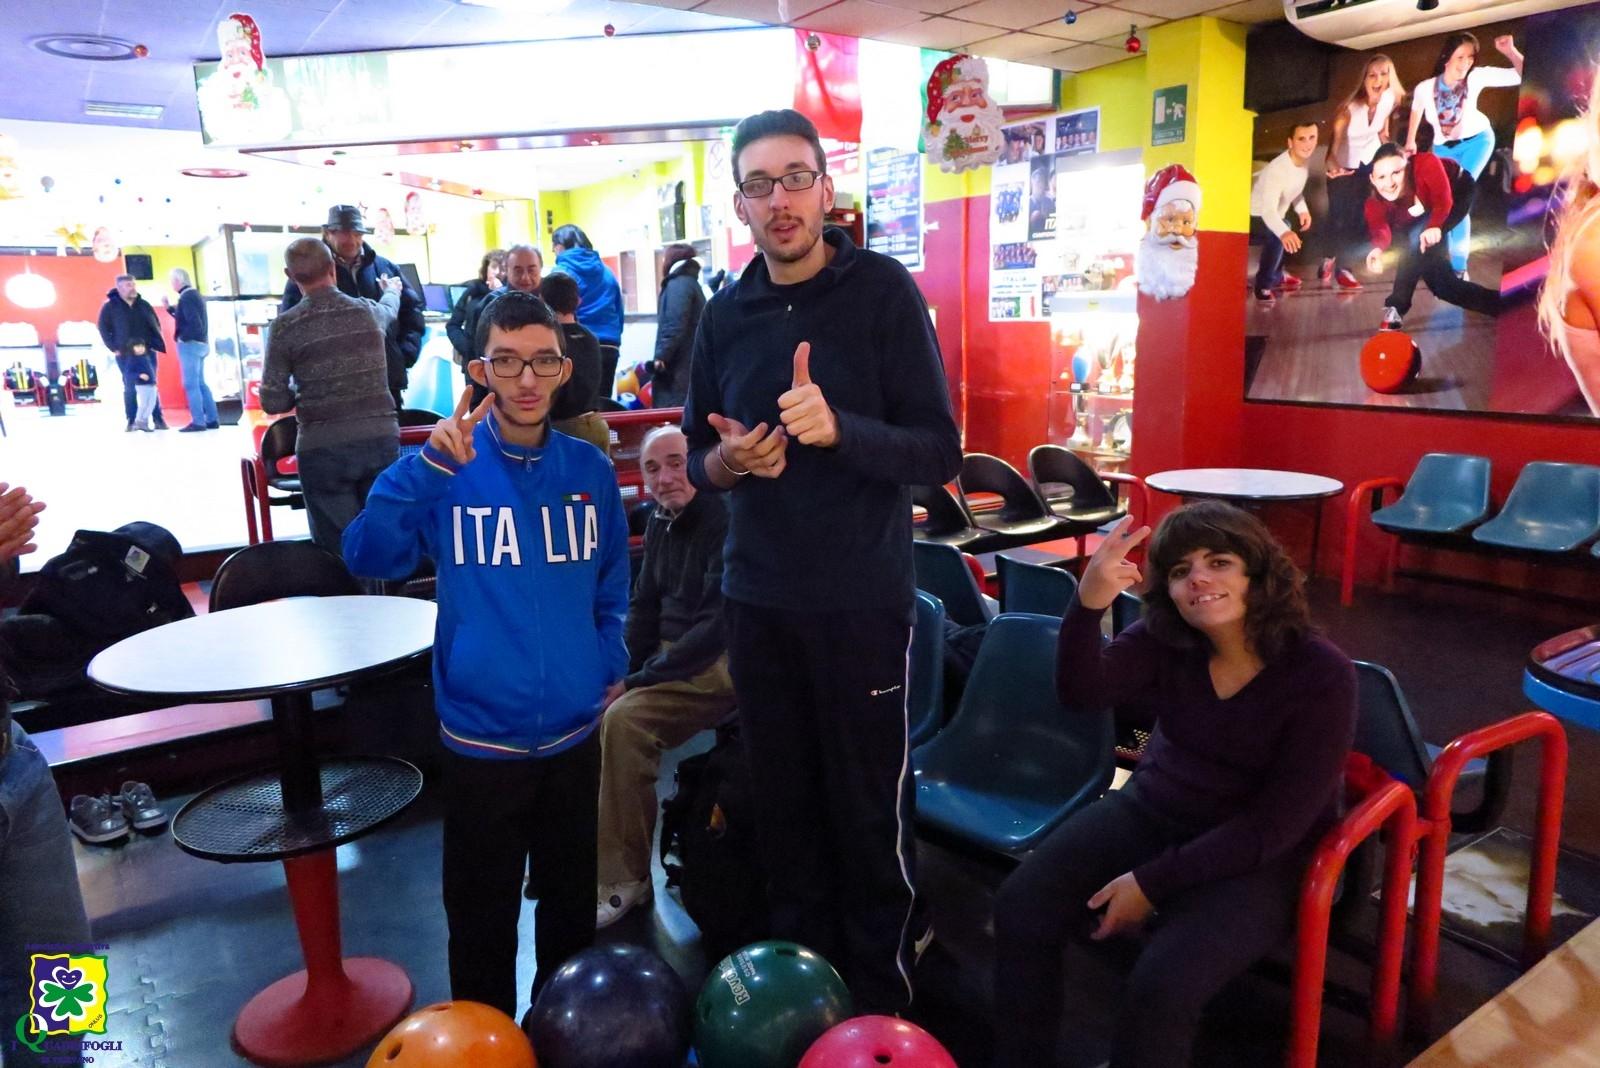 Torneo Bowling Vigevano 19-12-2018 - 004